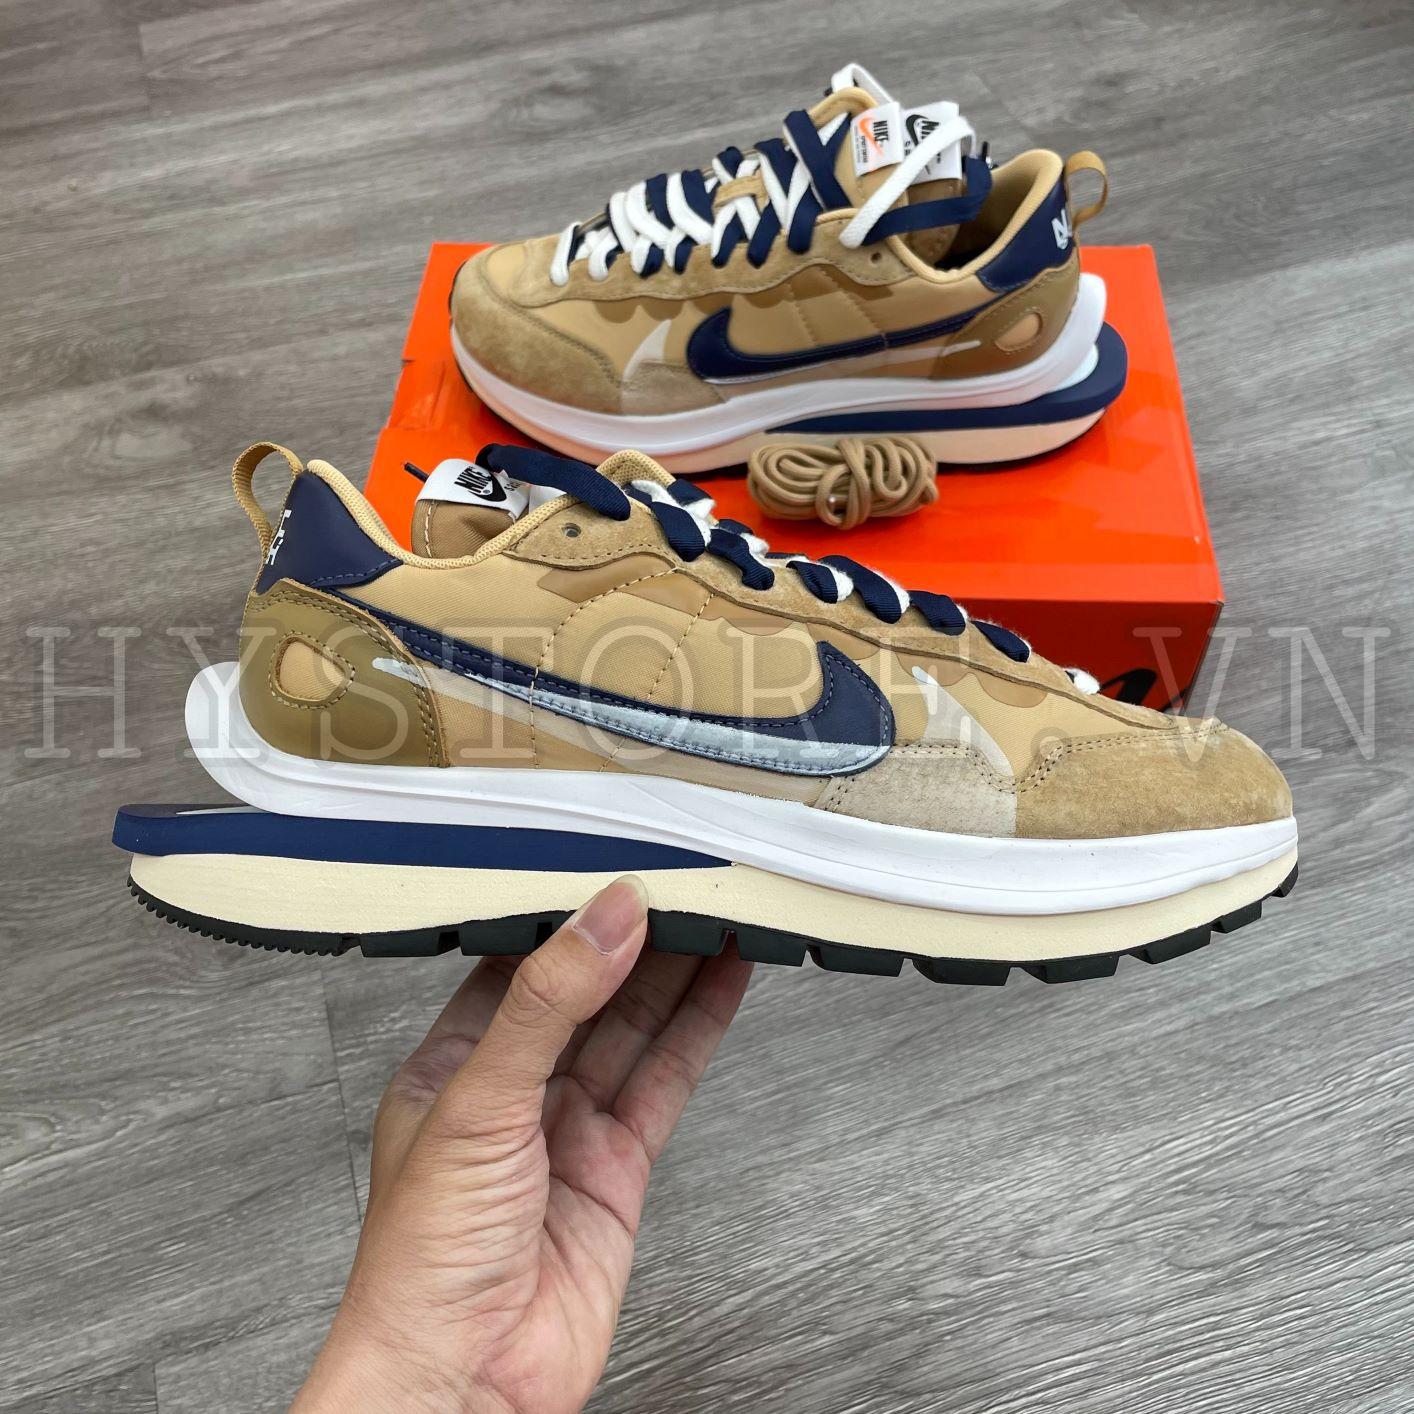 Giày Nike Sacai VaporWaffle Sesame